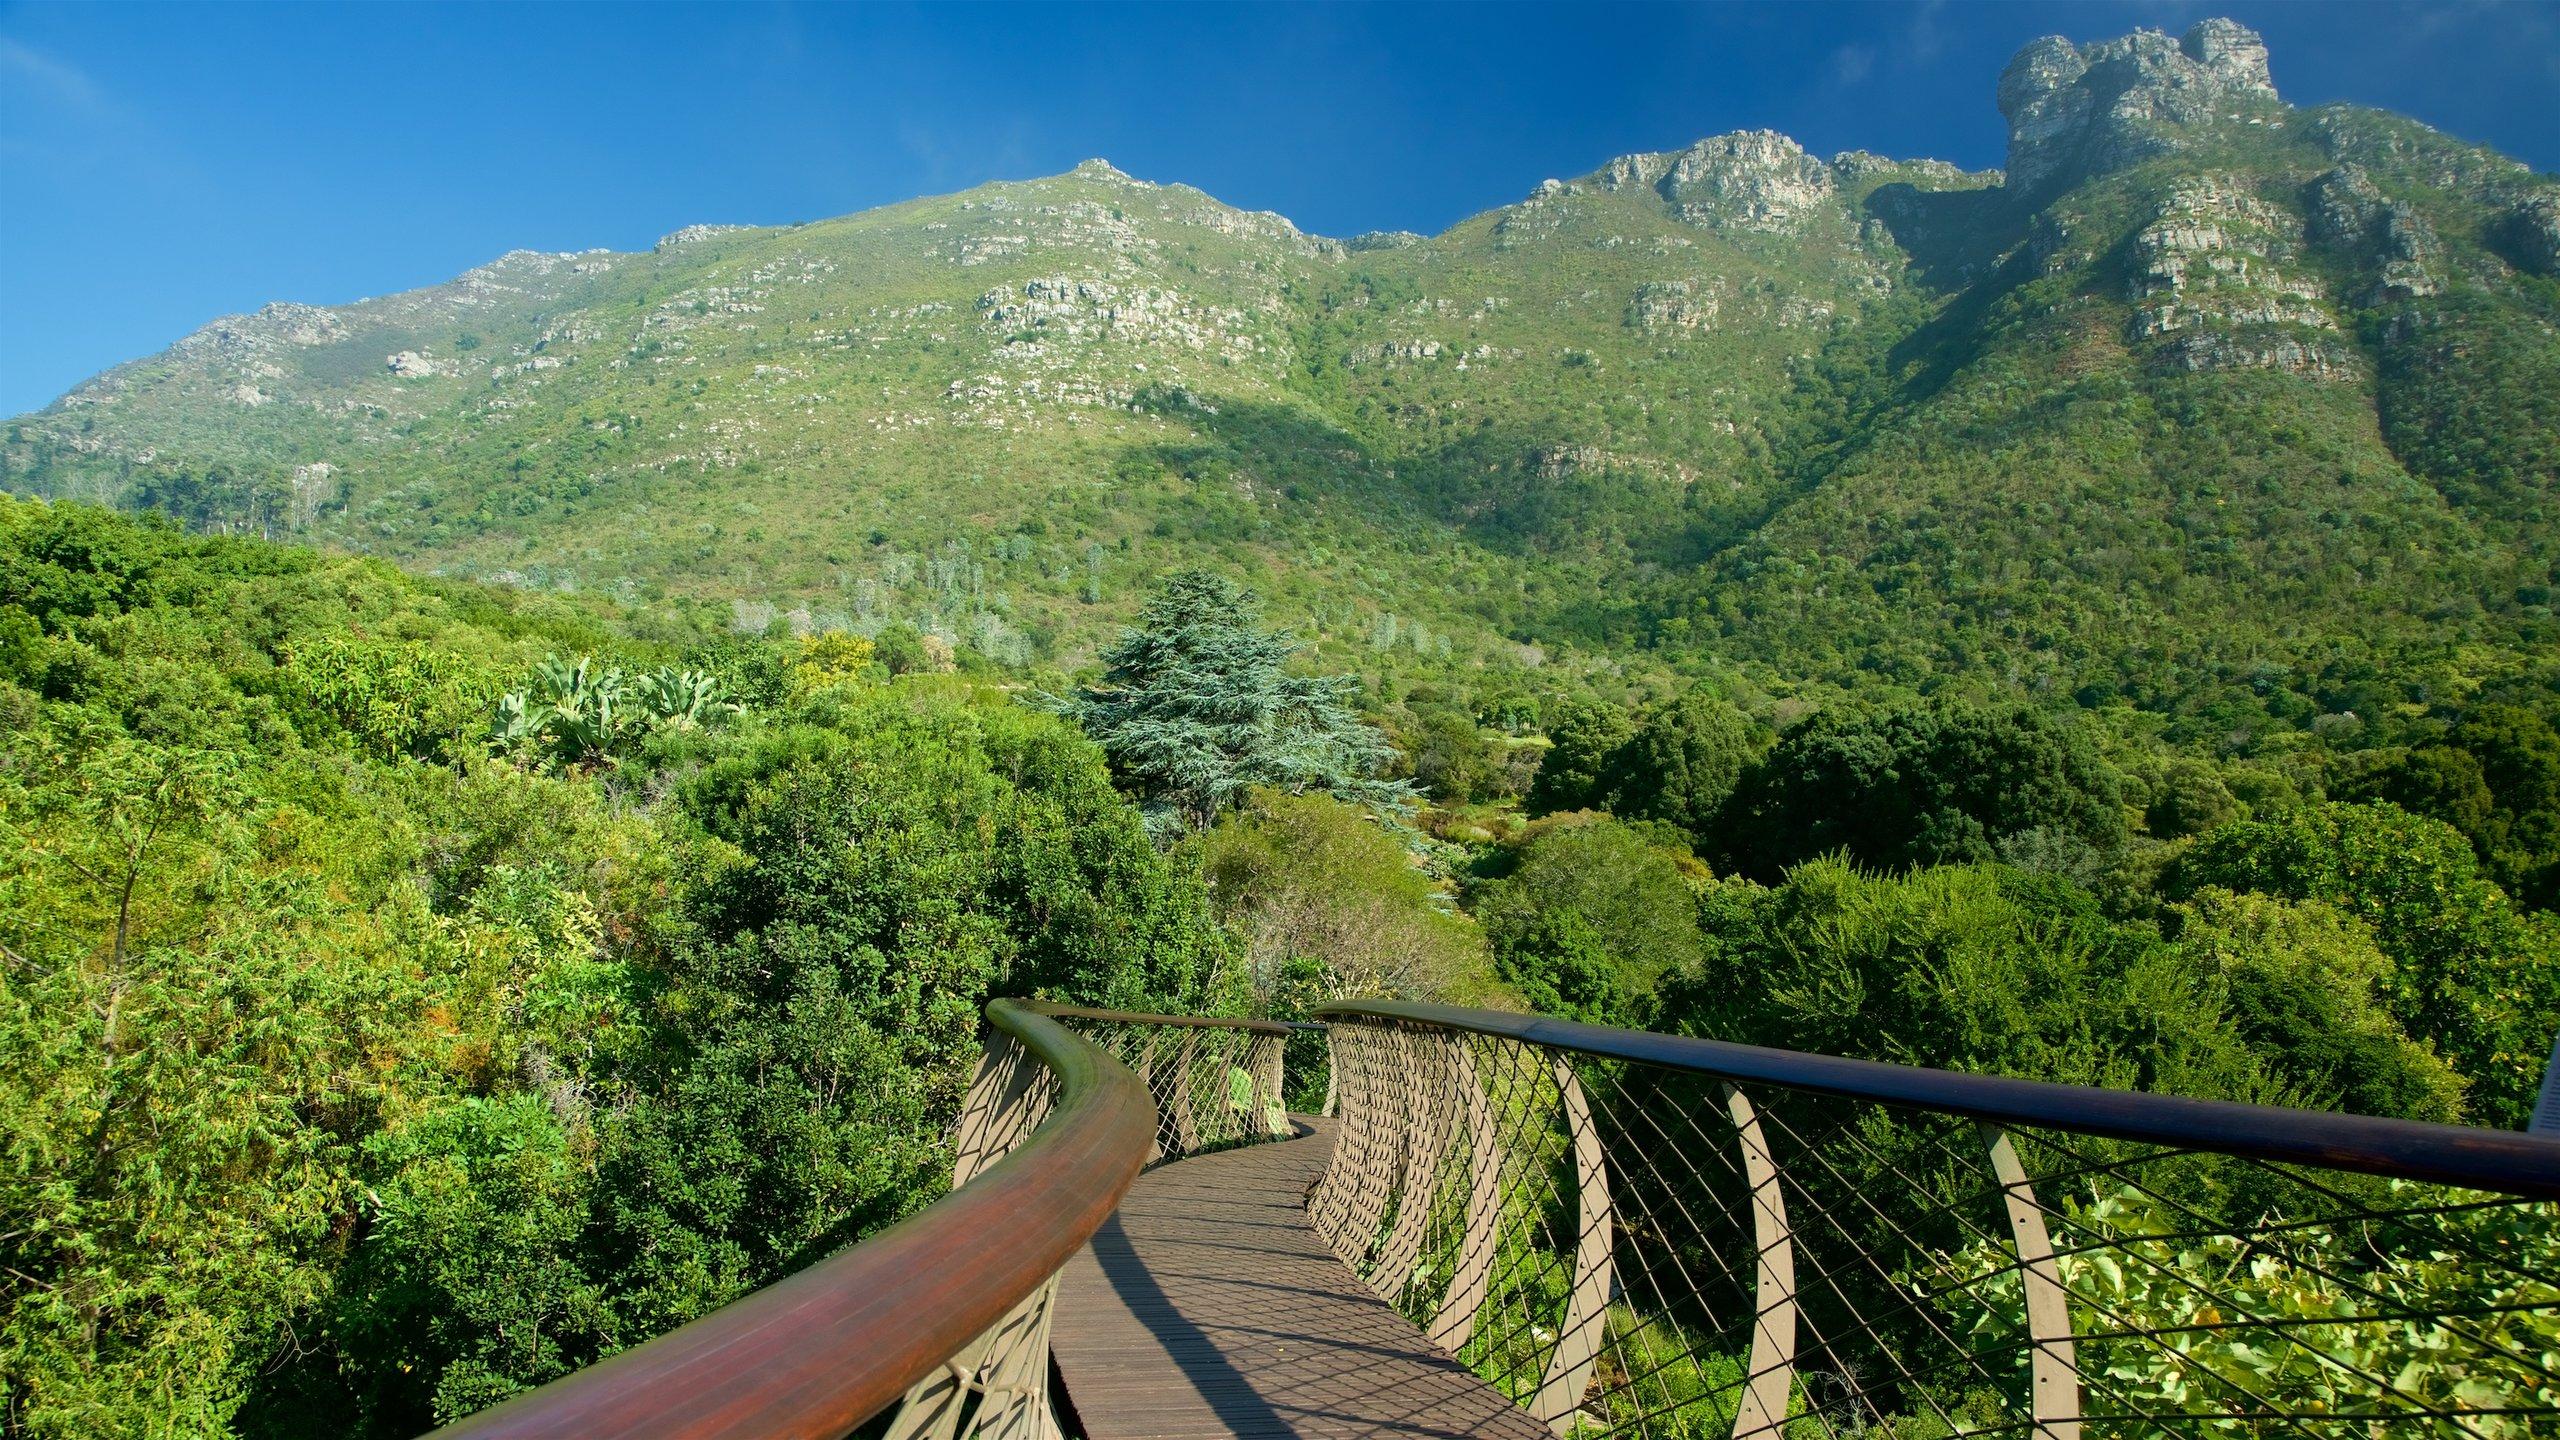 Kirstenbosch National Botanical Gardens, Cape Town, Western Cape, South Africa